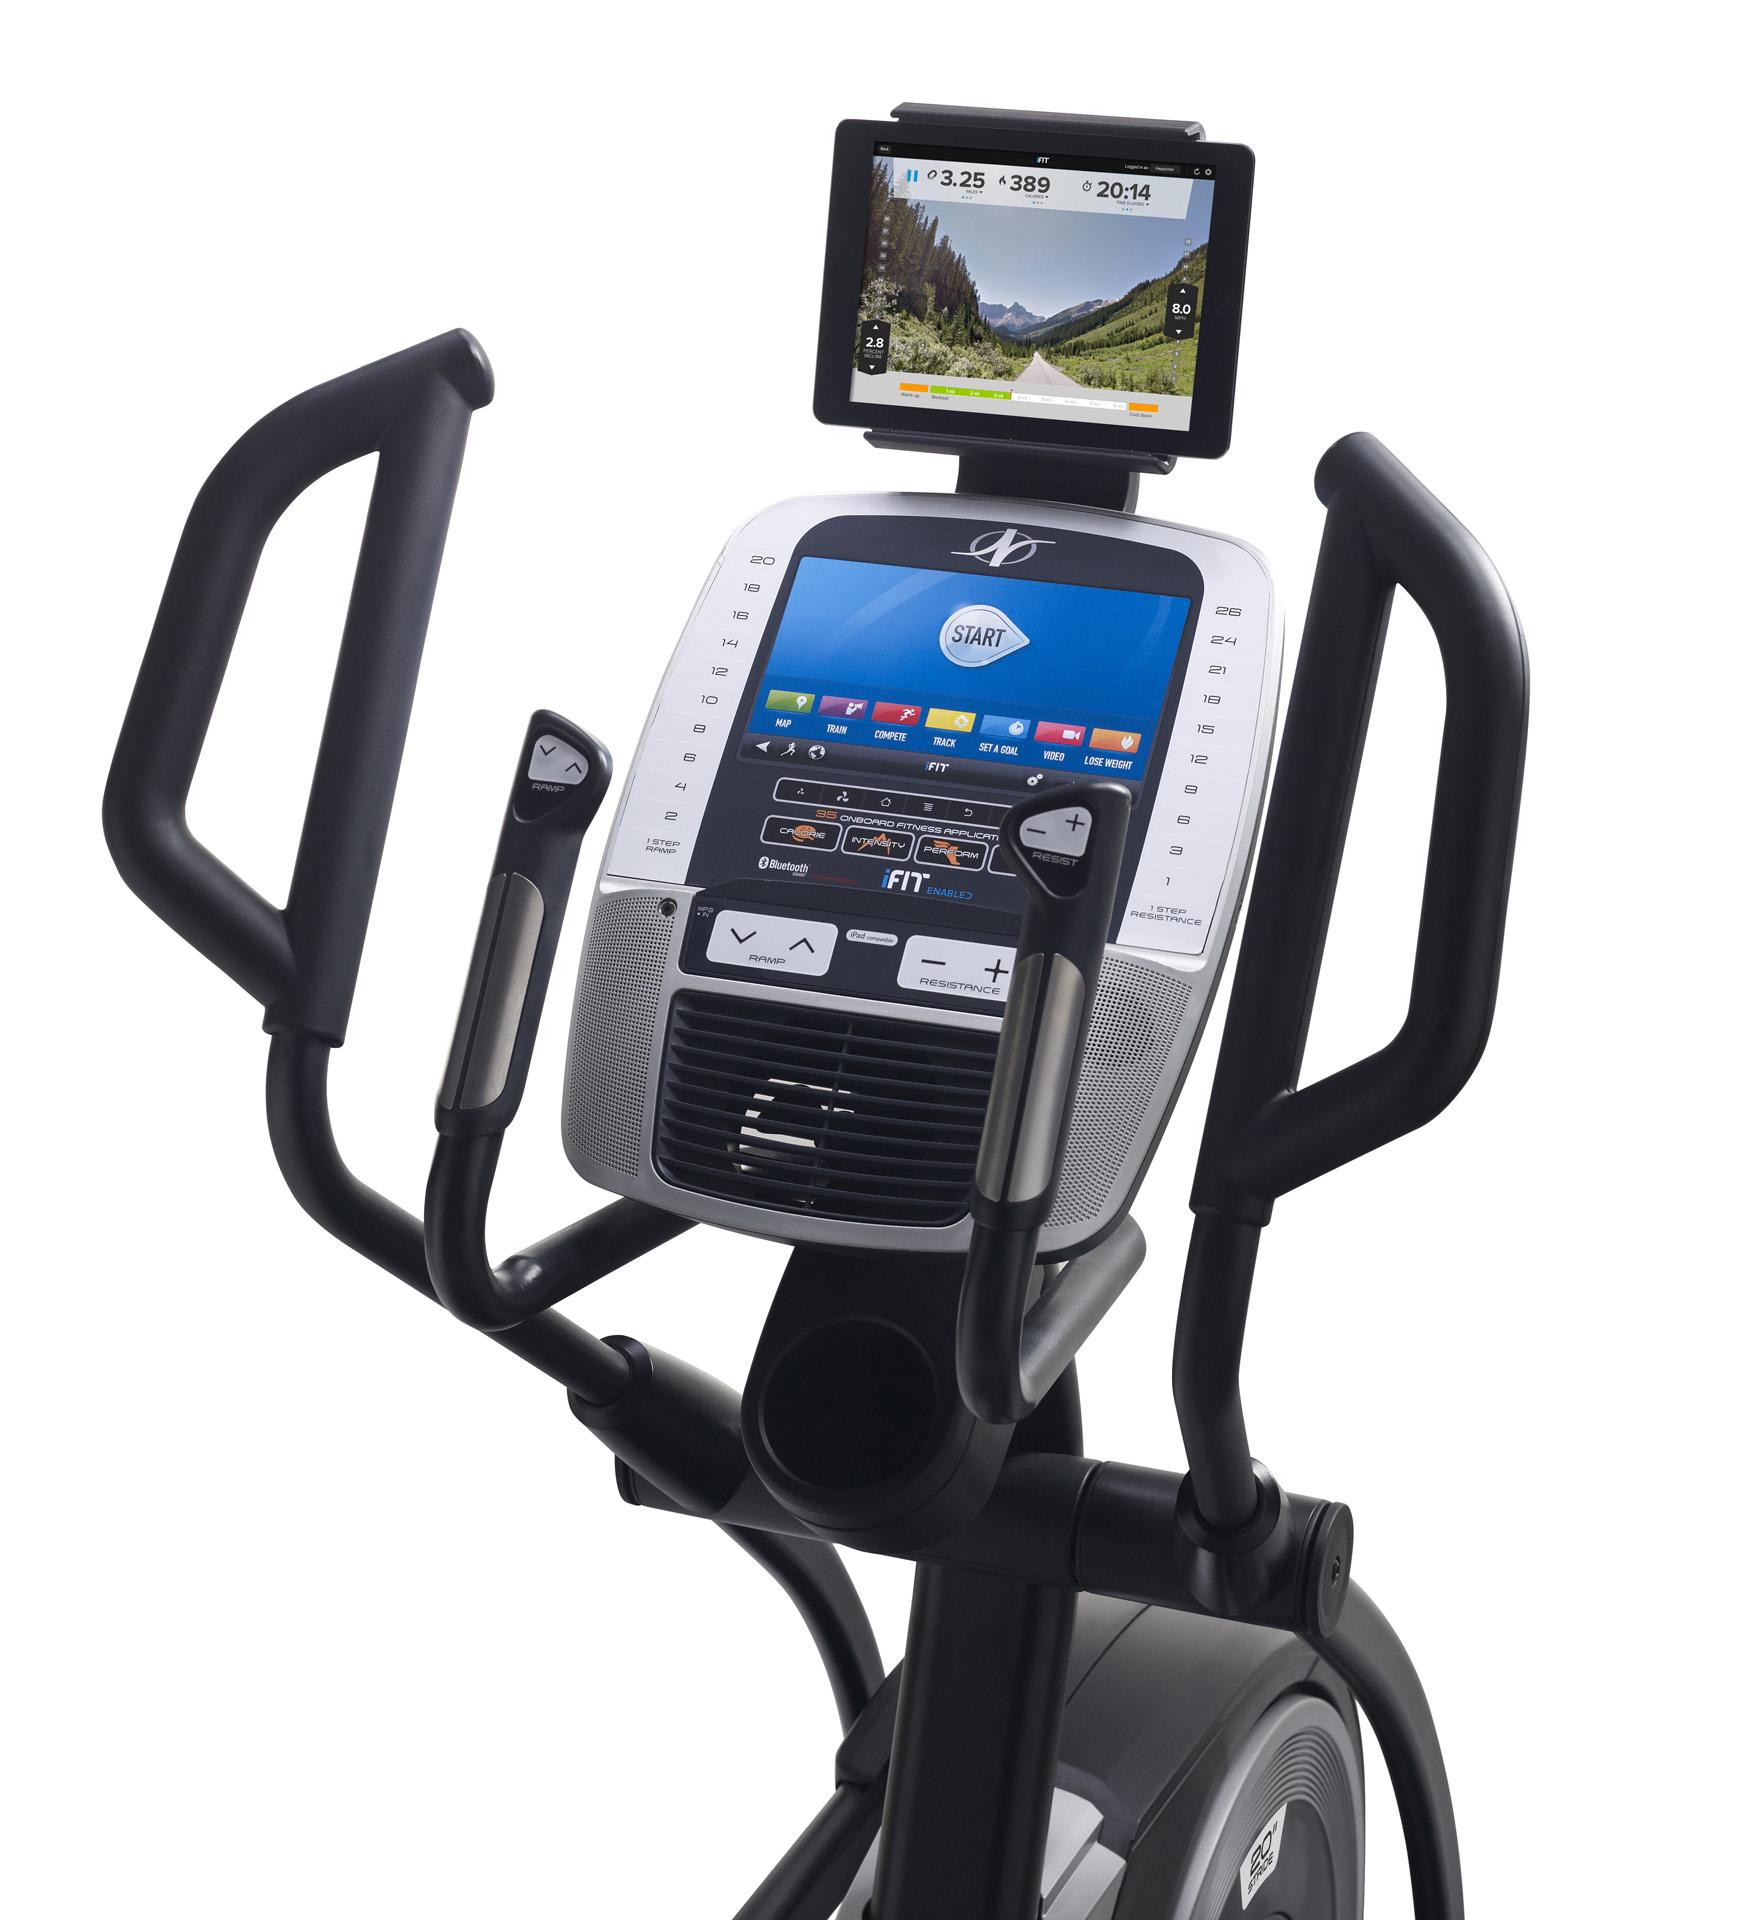 NordicTrack Elliptical Crosstrainer Commerical 12.9